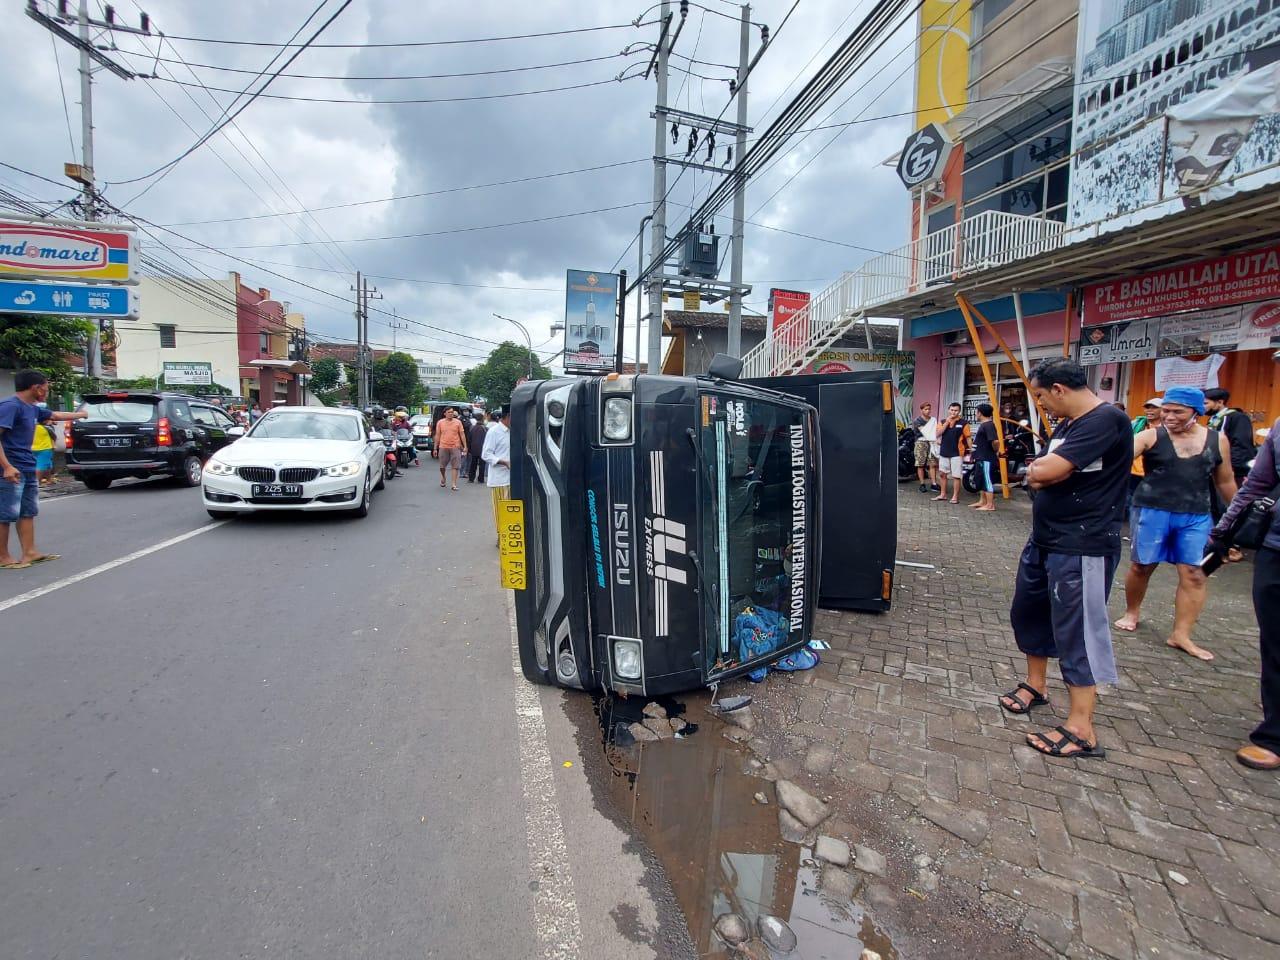 Kecelakaan lalu lintas di Malang yang mengakibatkan 1 mobil boks terguling. Beruntung tidak ada korban jiwa dalam kejadian ini. (Foto: Dokumen/Tugu Malang) tugu jatim